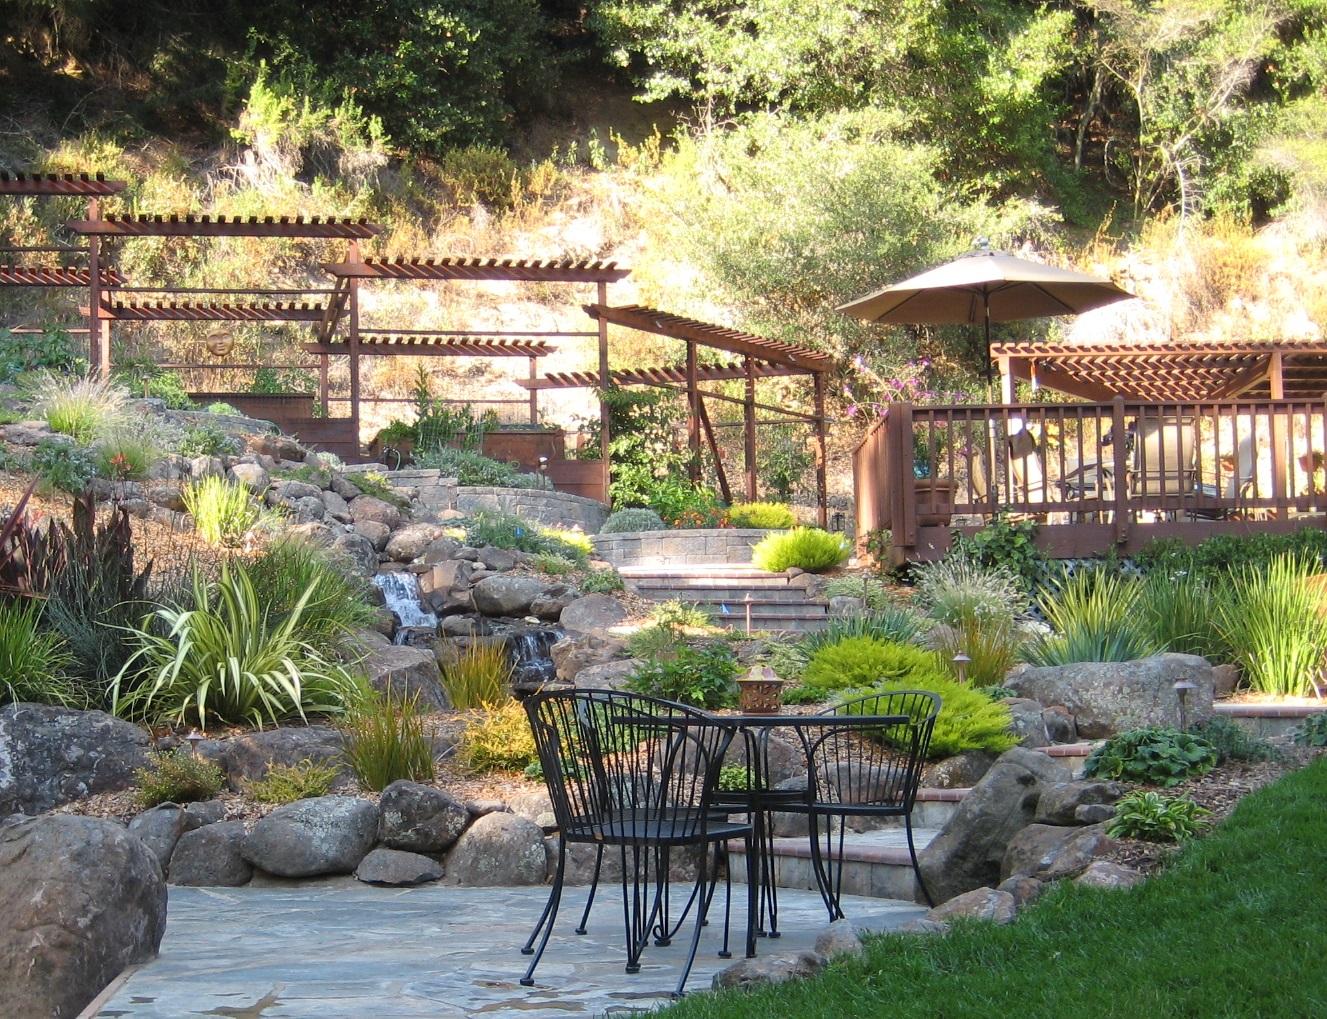 Images Vegetable Garden Fence